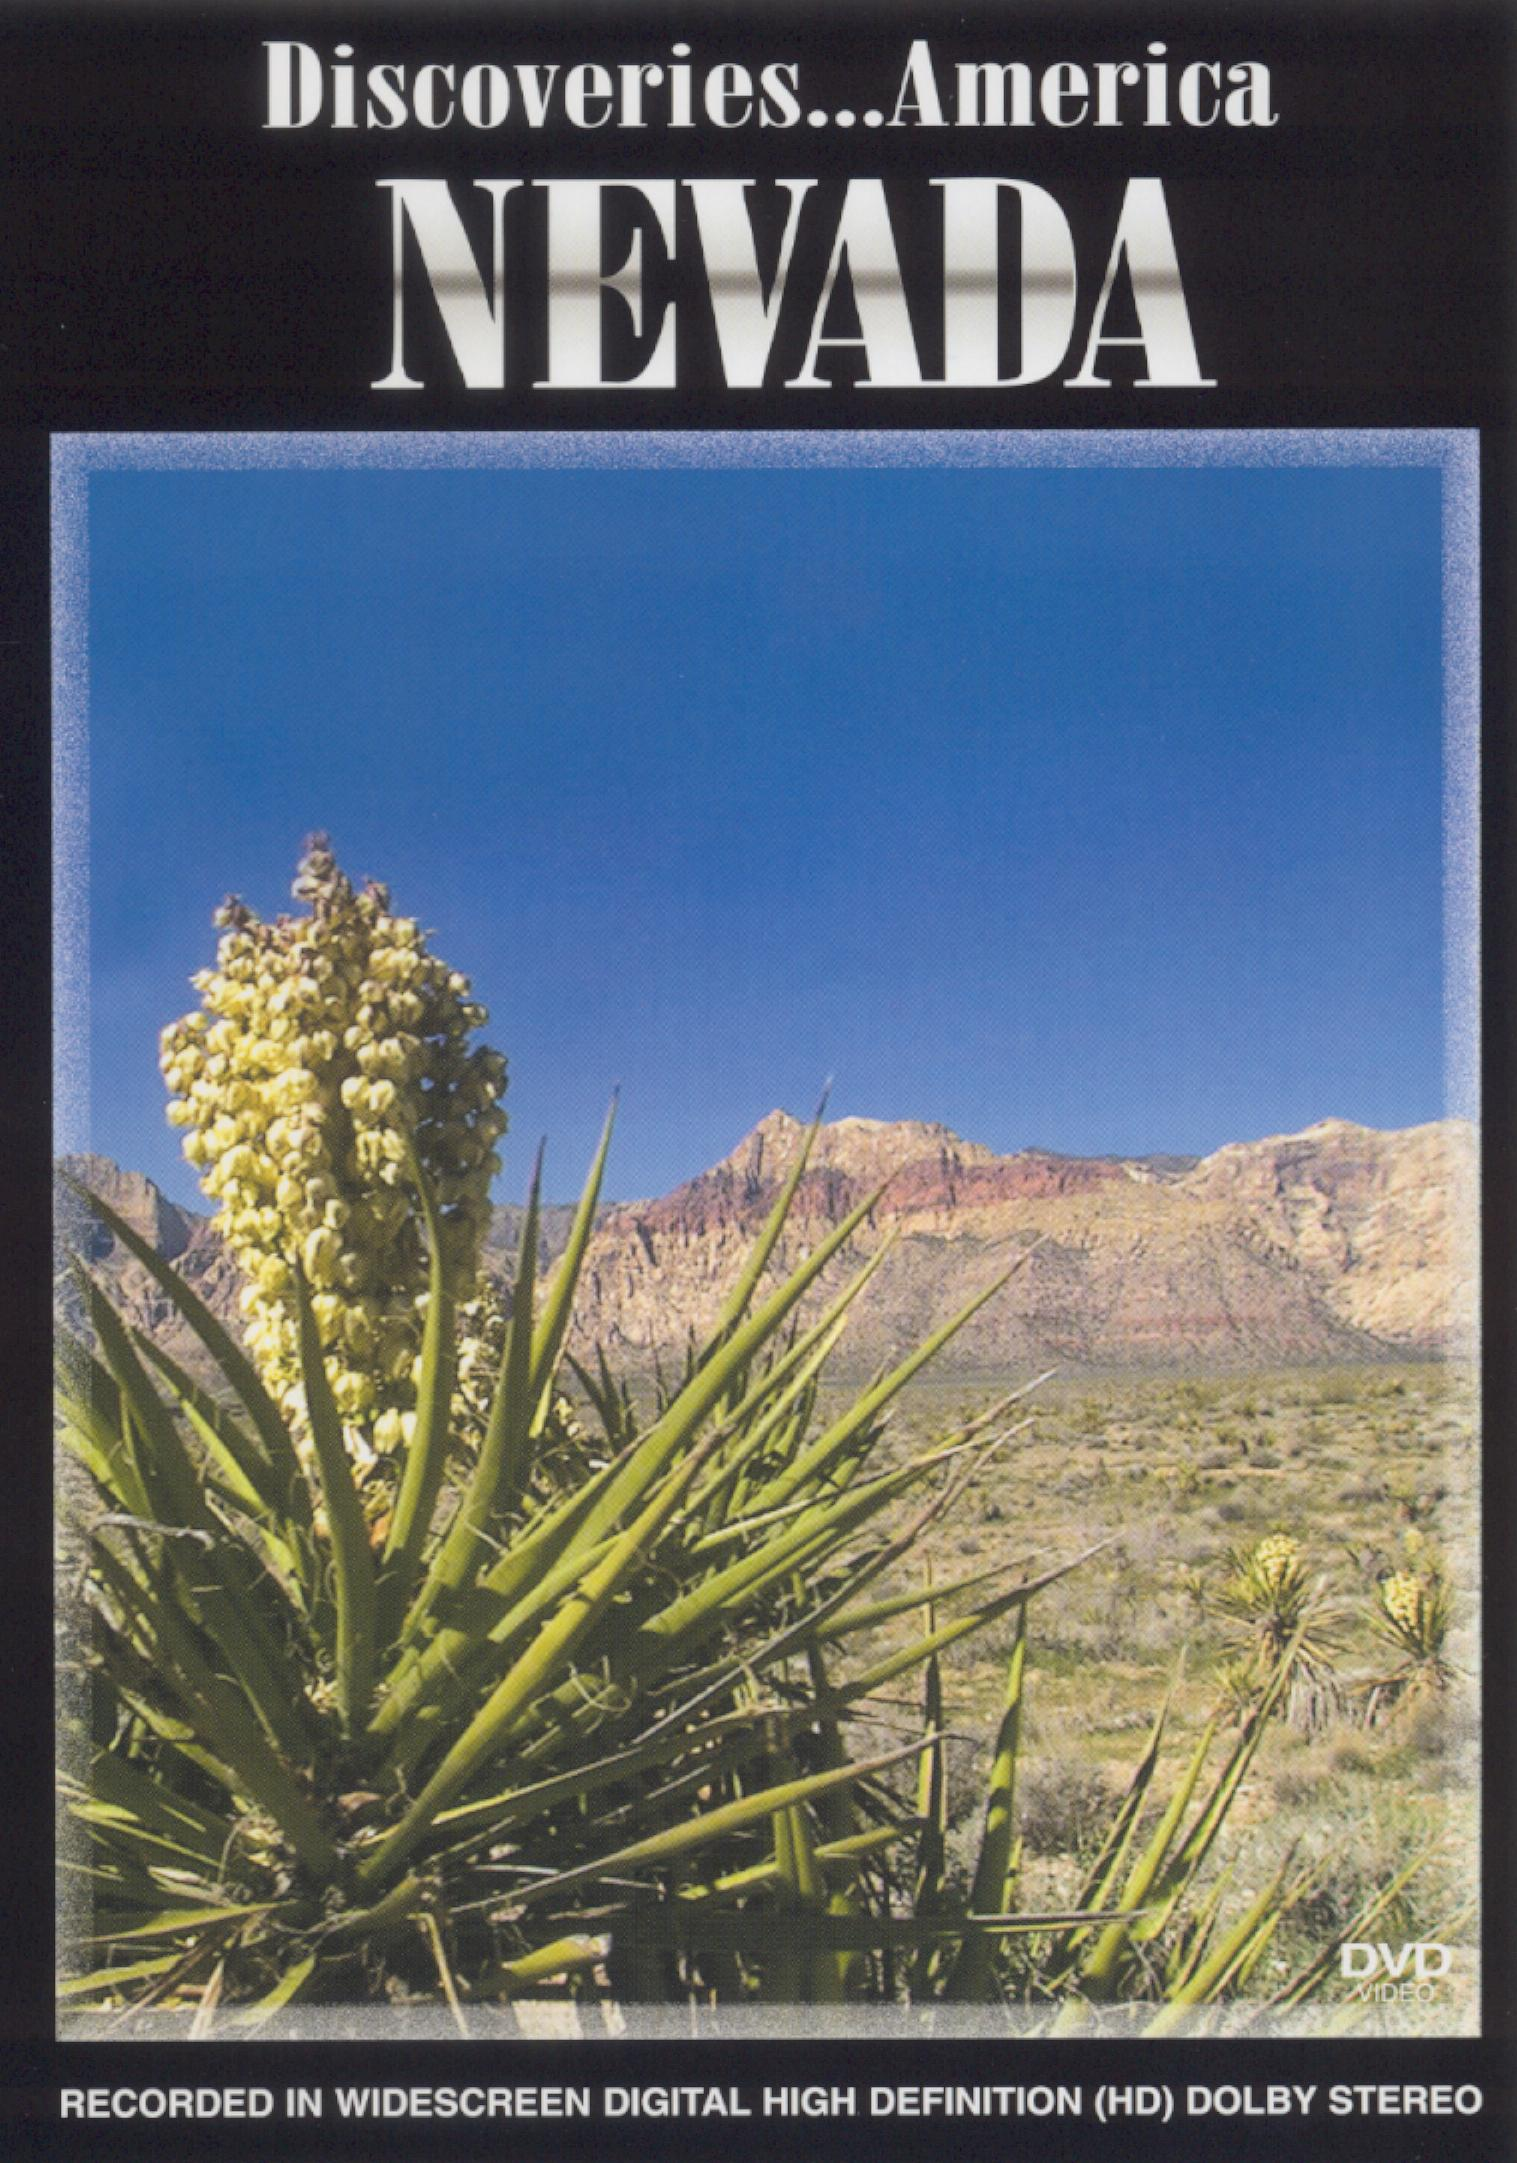 Discoveries... America: Nevada